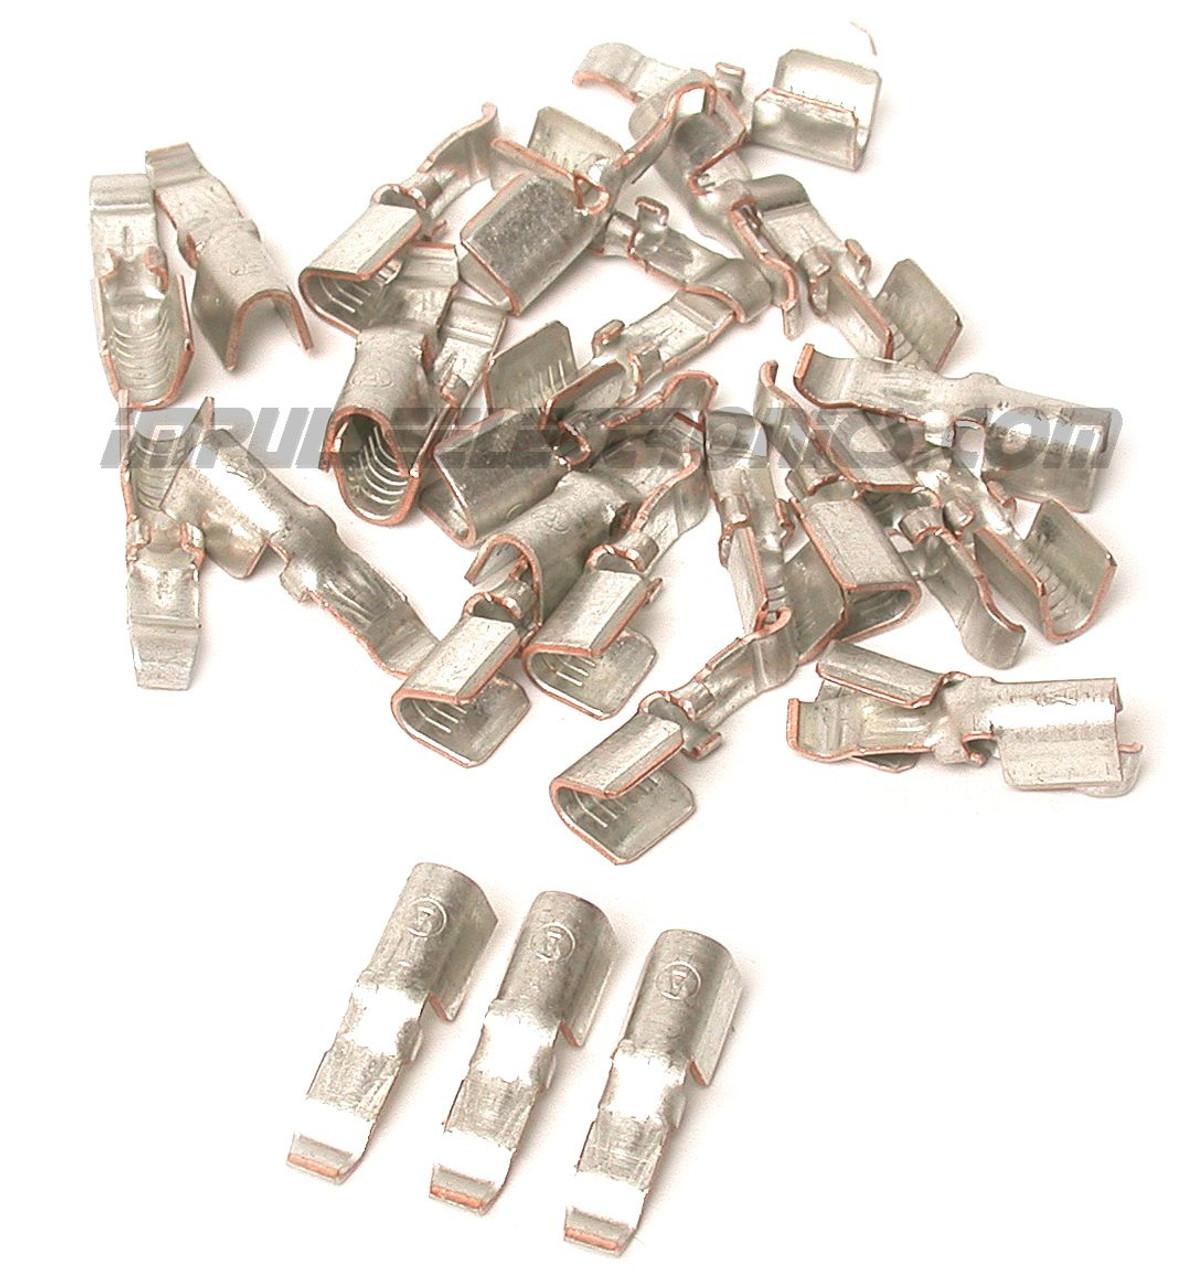 45 Amp Loose Piece Powerpole Contact, 50 Pak